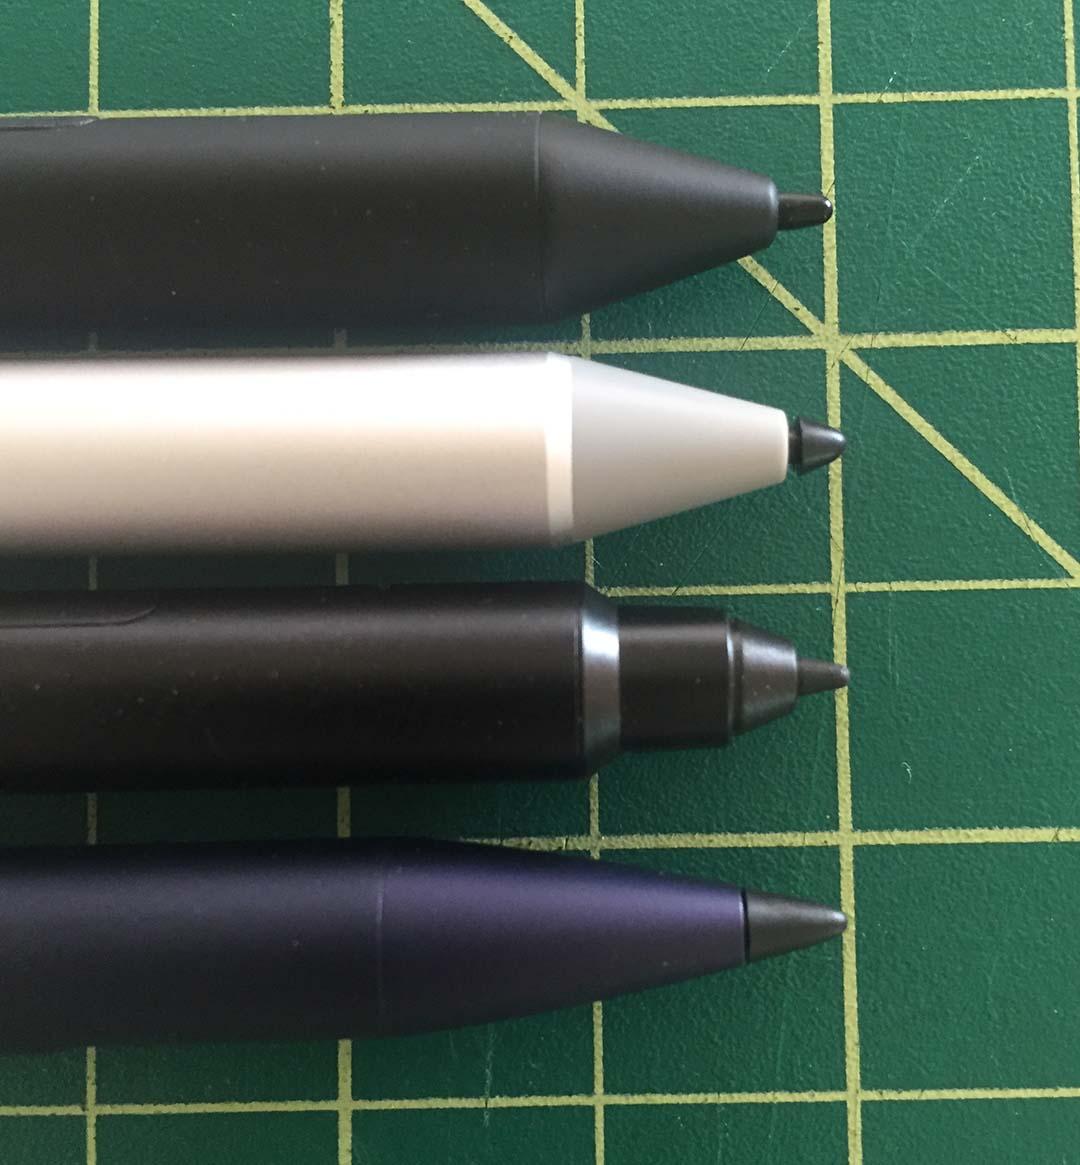 Nuvision, Adonit enter Windows pen market — Surface Pro Artist